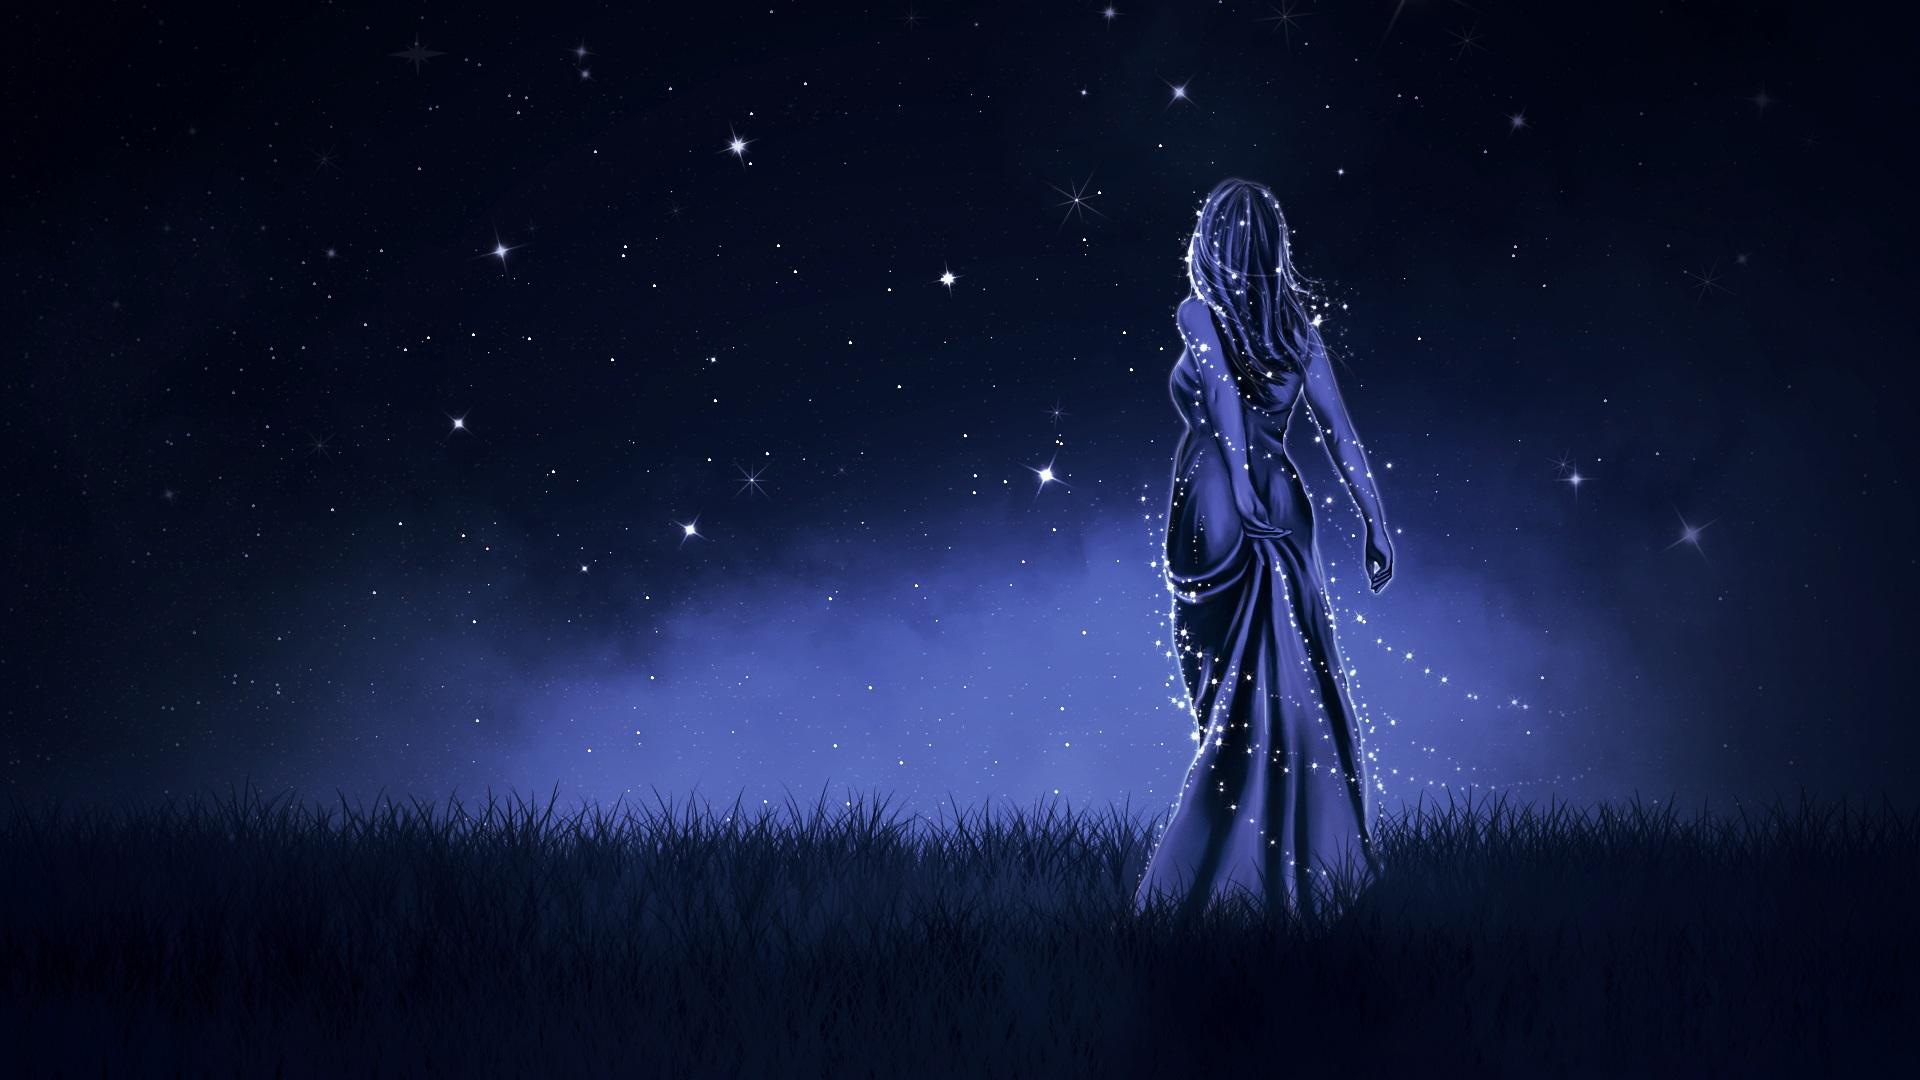 horoscop saptamanal spiritual - sfatulparintilor.ro - pixabay-com - wallpaper-830417